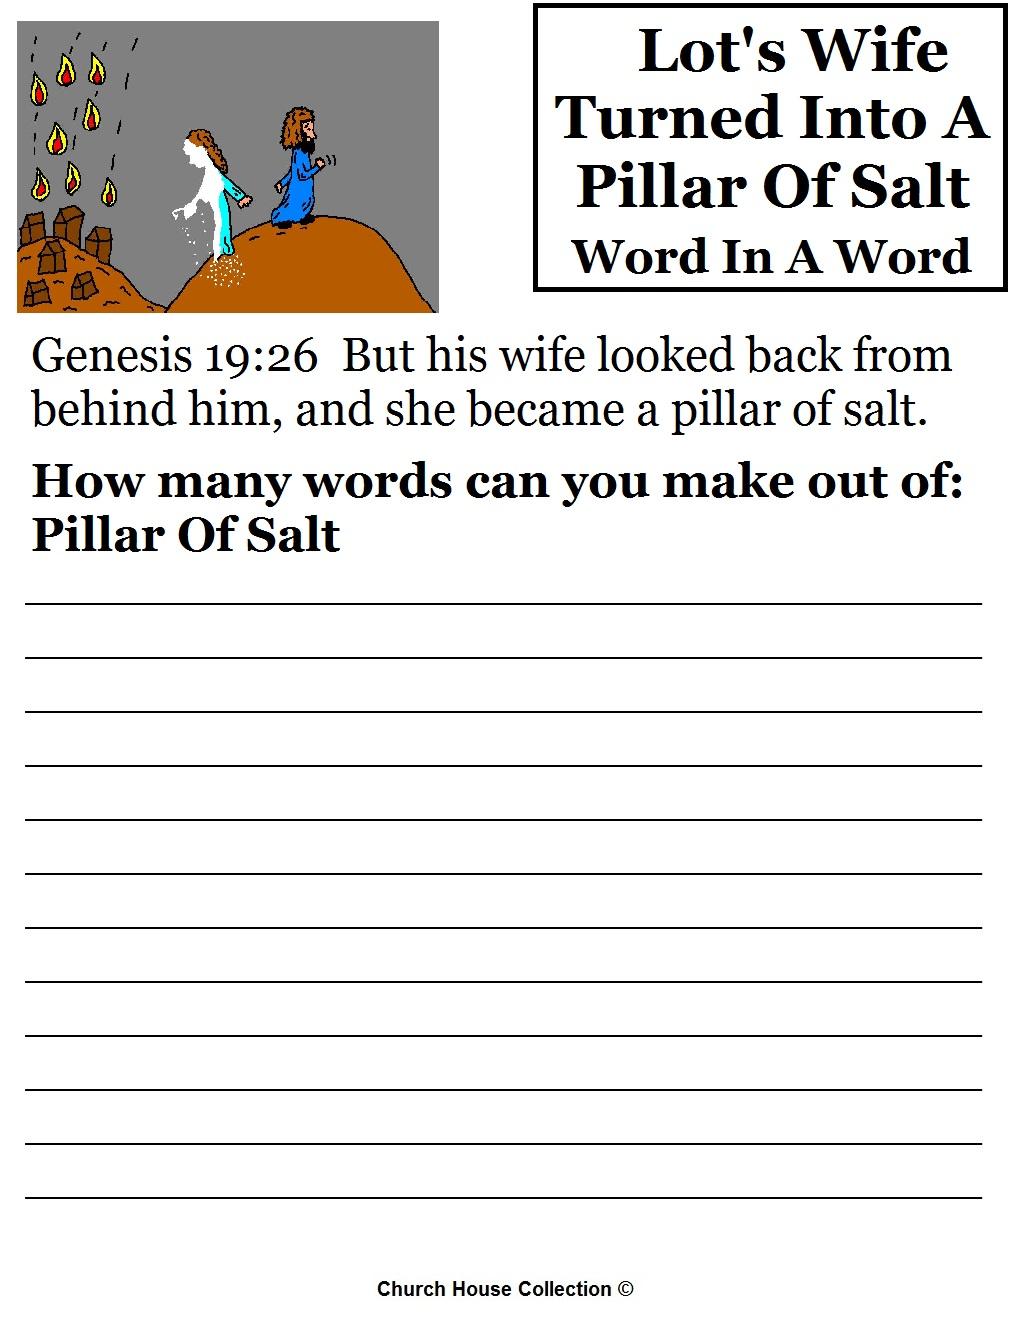 Lots Wife Pillar Of Salt Sunday School Lesson